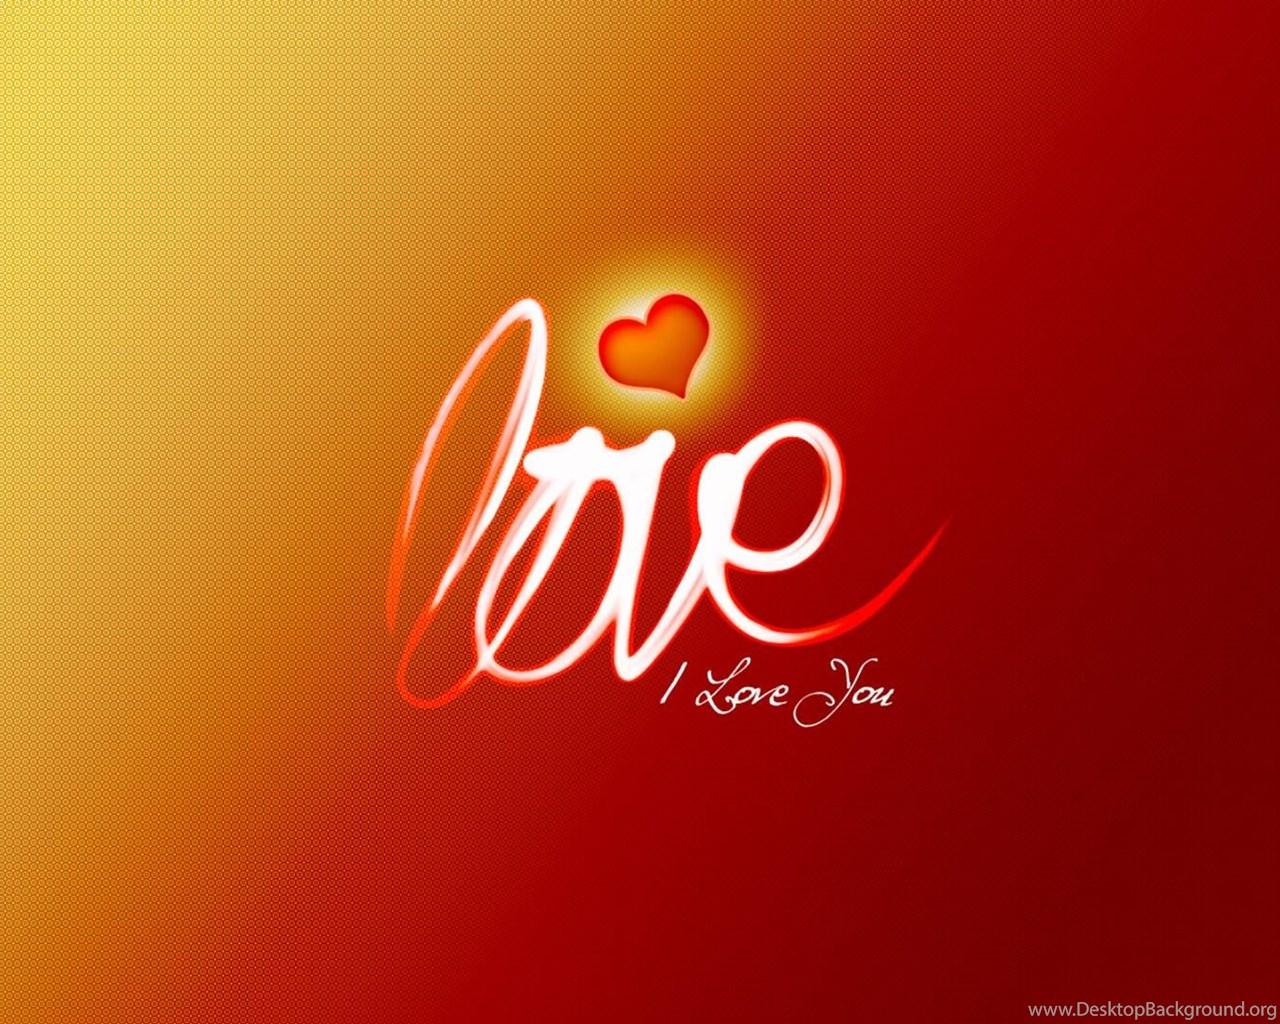 Beautiful Love Hd Wallpapers Free Download In 1080p Desktop Background